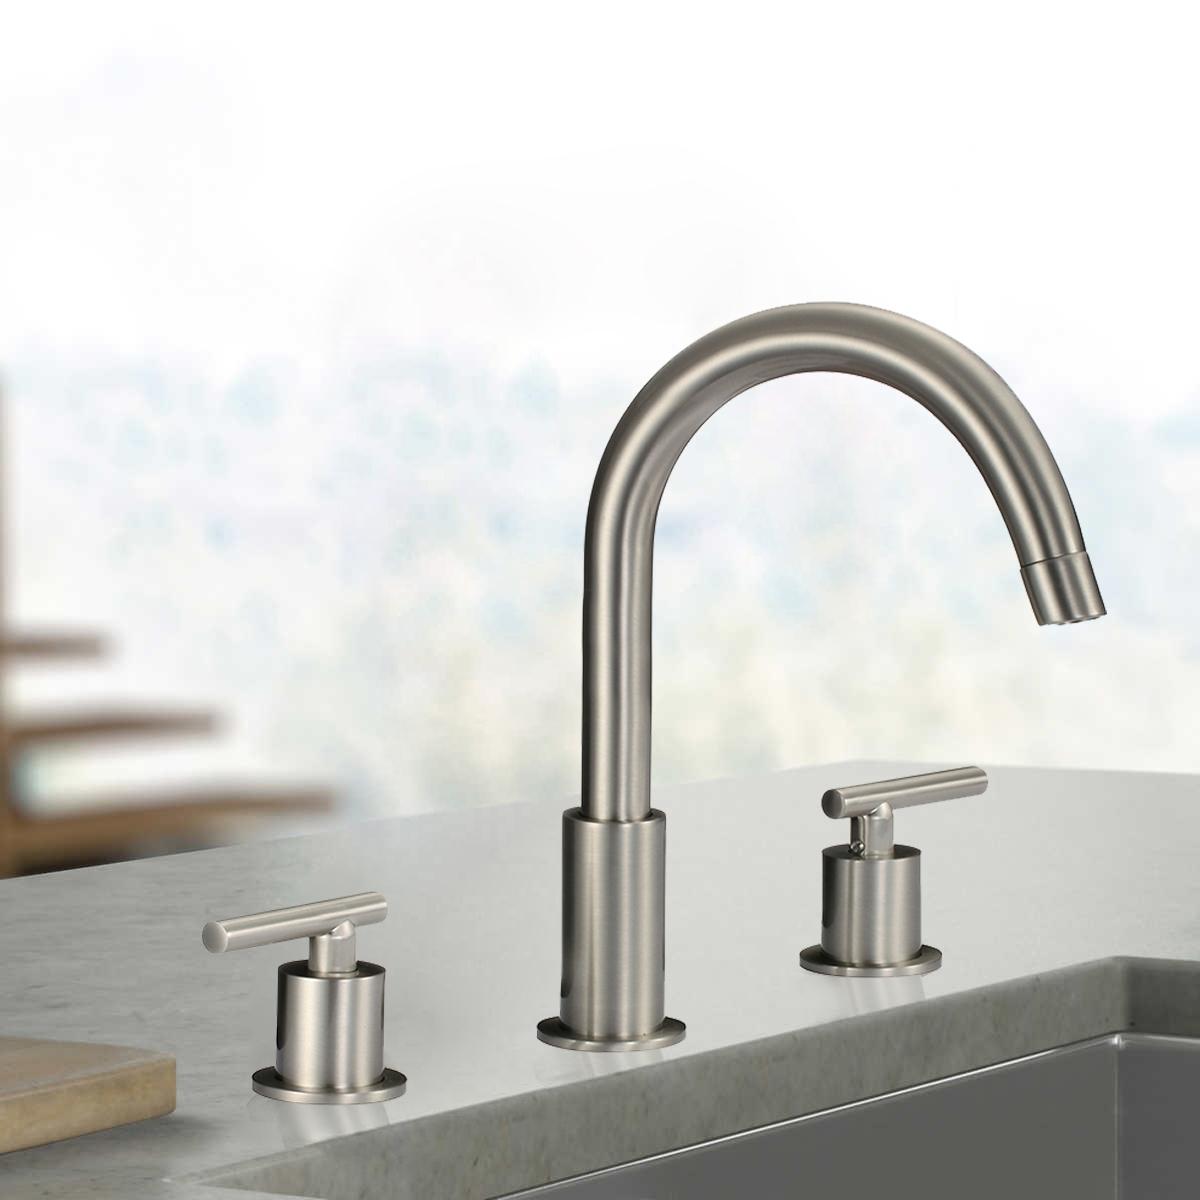 Genoa Dual Handle Bathroom Sink Faucet